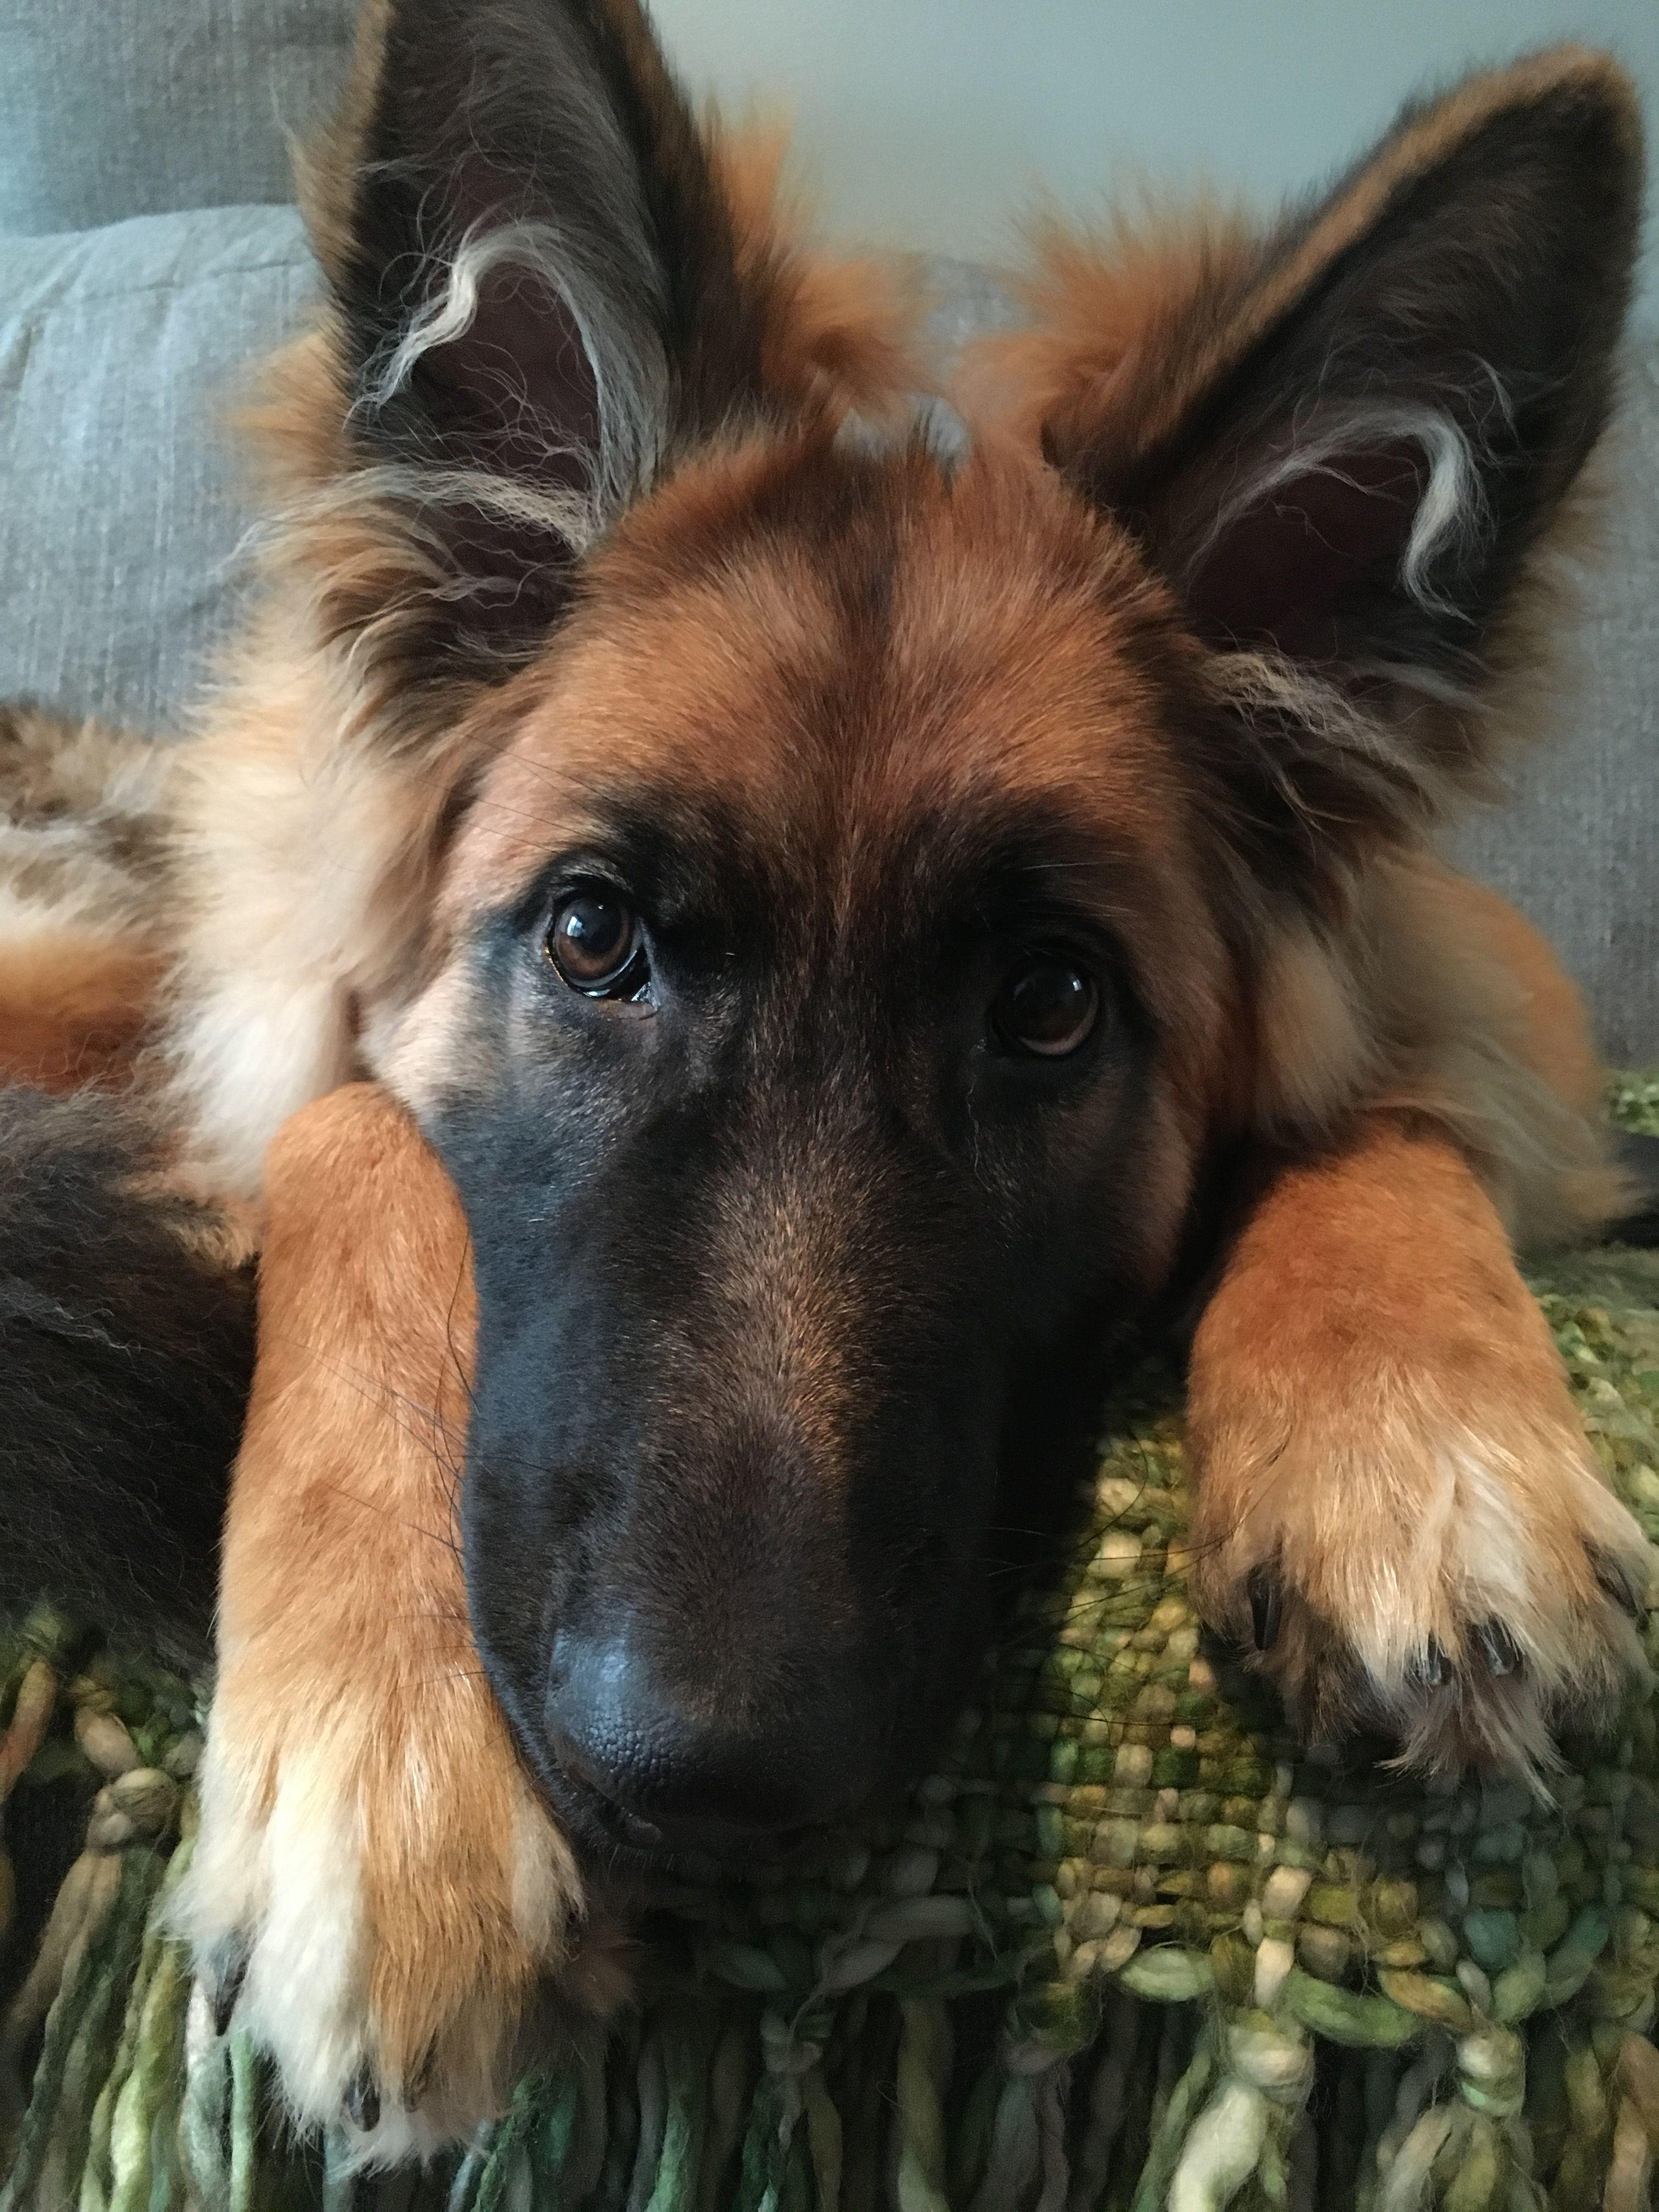 Pin By Izzy Sickles On Cute Animals German Shepherd Dogs German